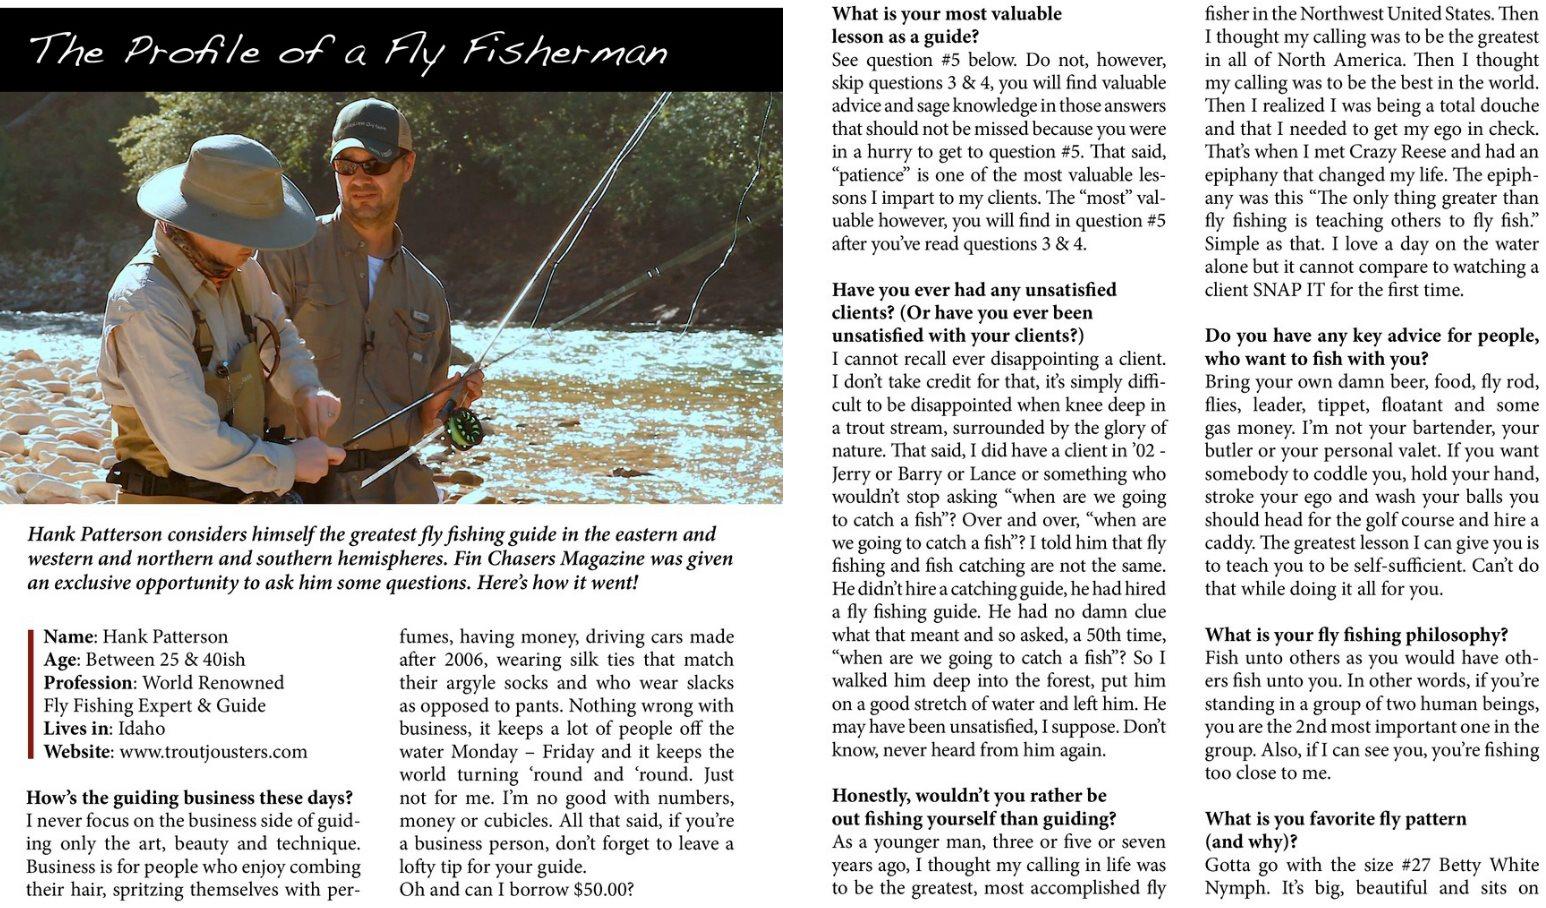 Scott hopper 39 s blog hank patterson loves the betty white for Hank patterson fly fishing